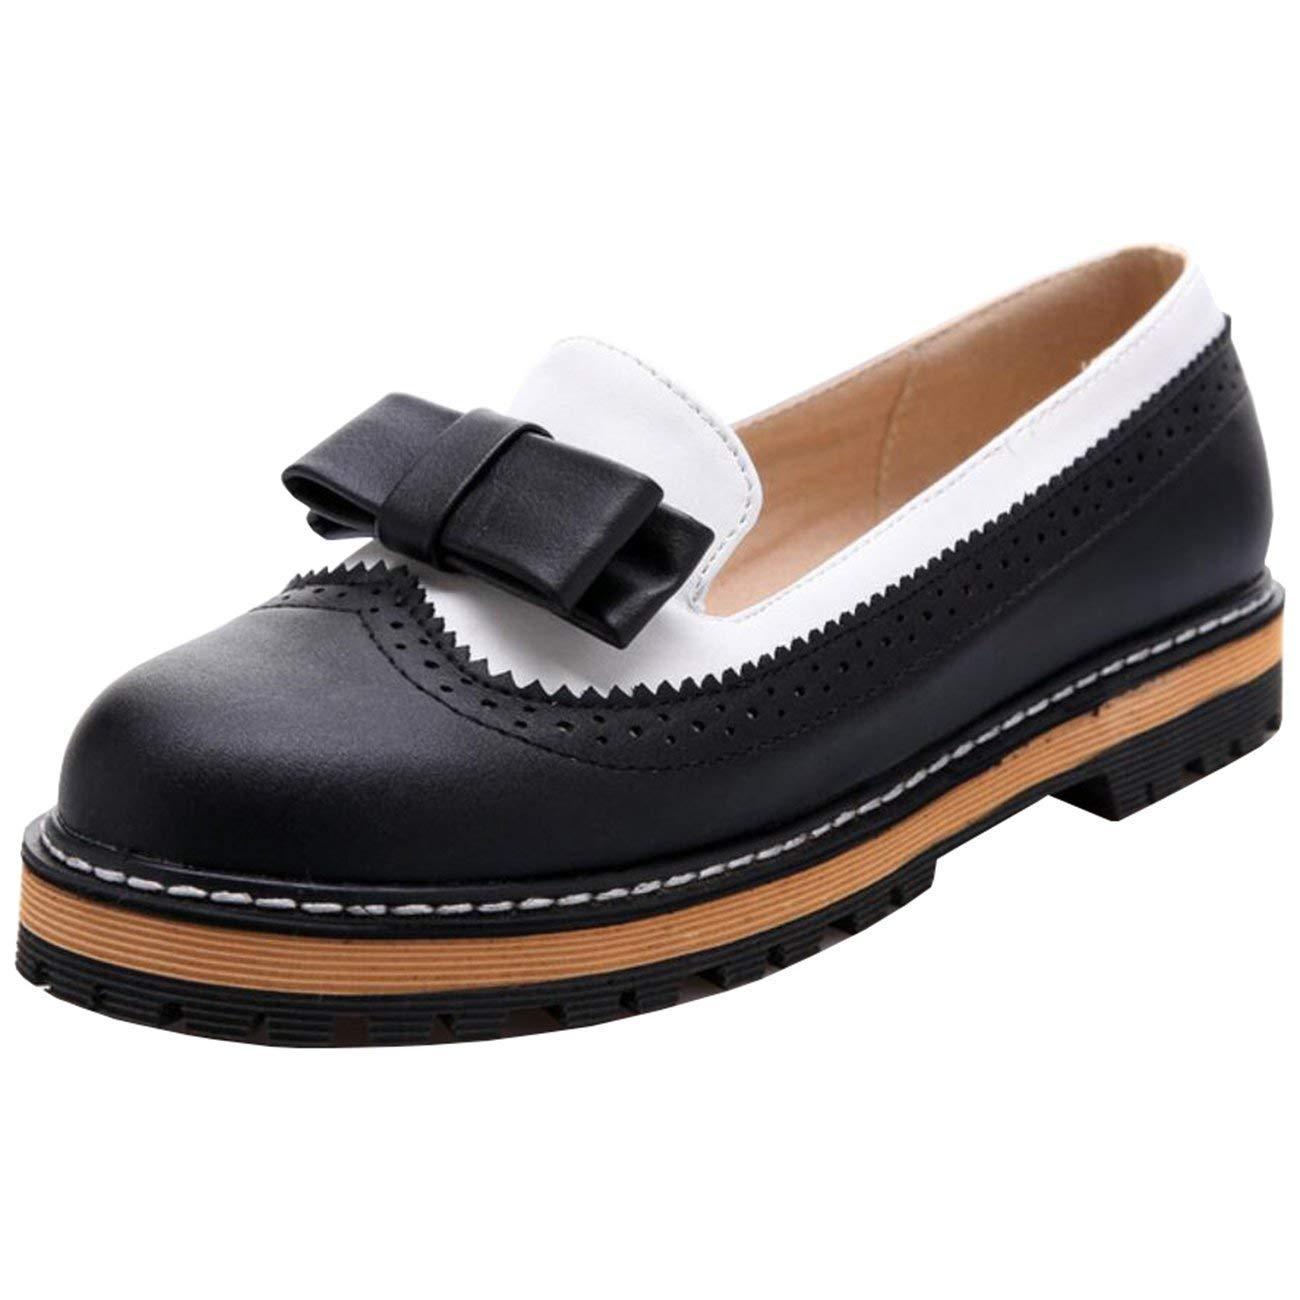 Fuxitoggo Damen Bowknot Round-Toe Flache Slip-On Loafers (Farbe   Schwarz Größe   7 UK)